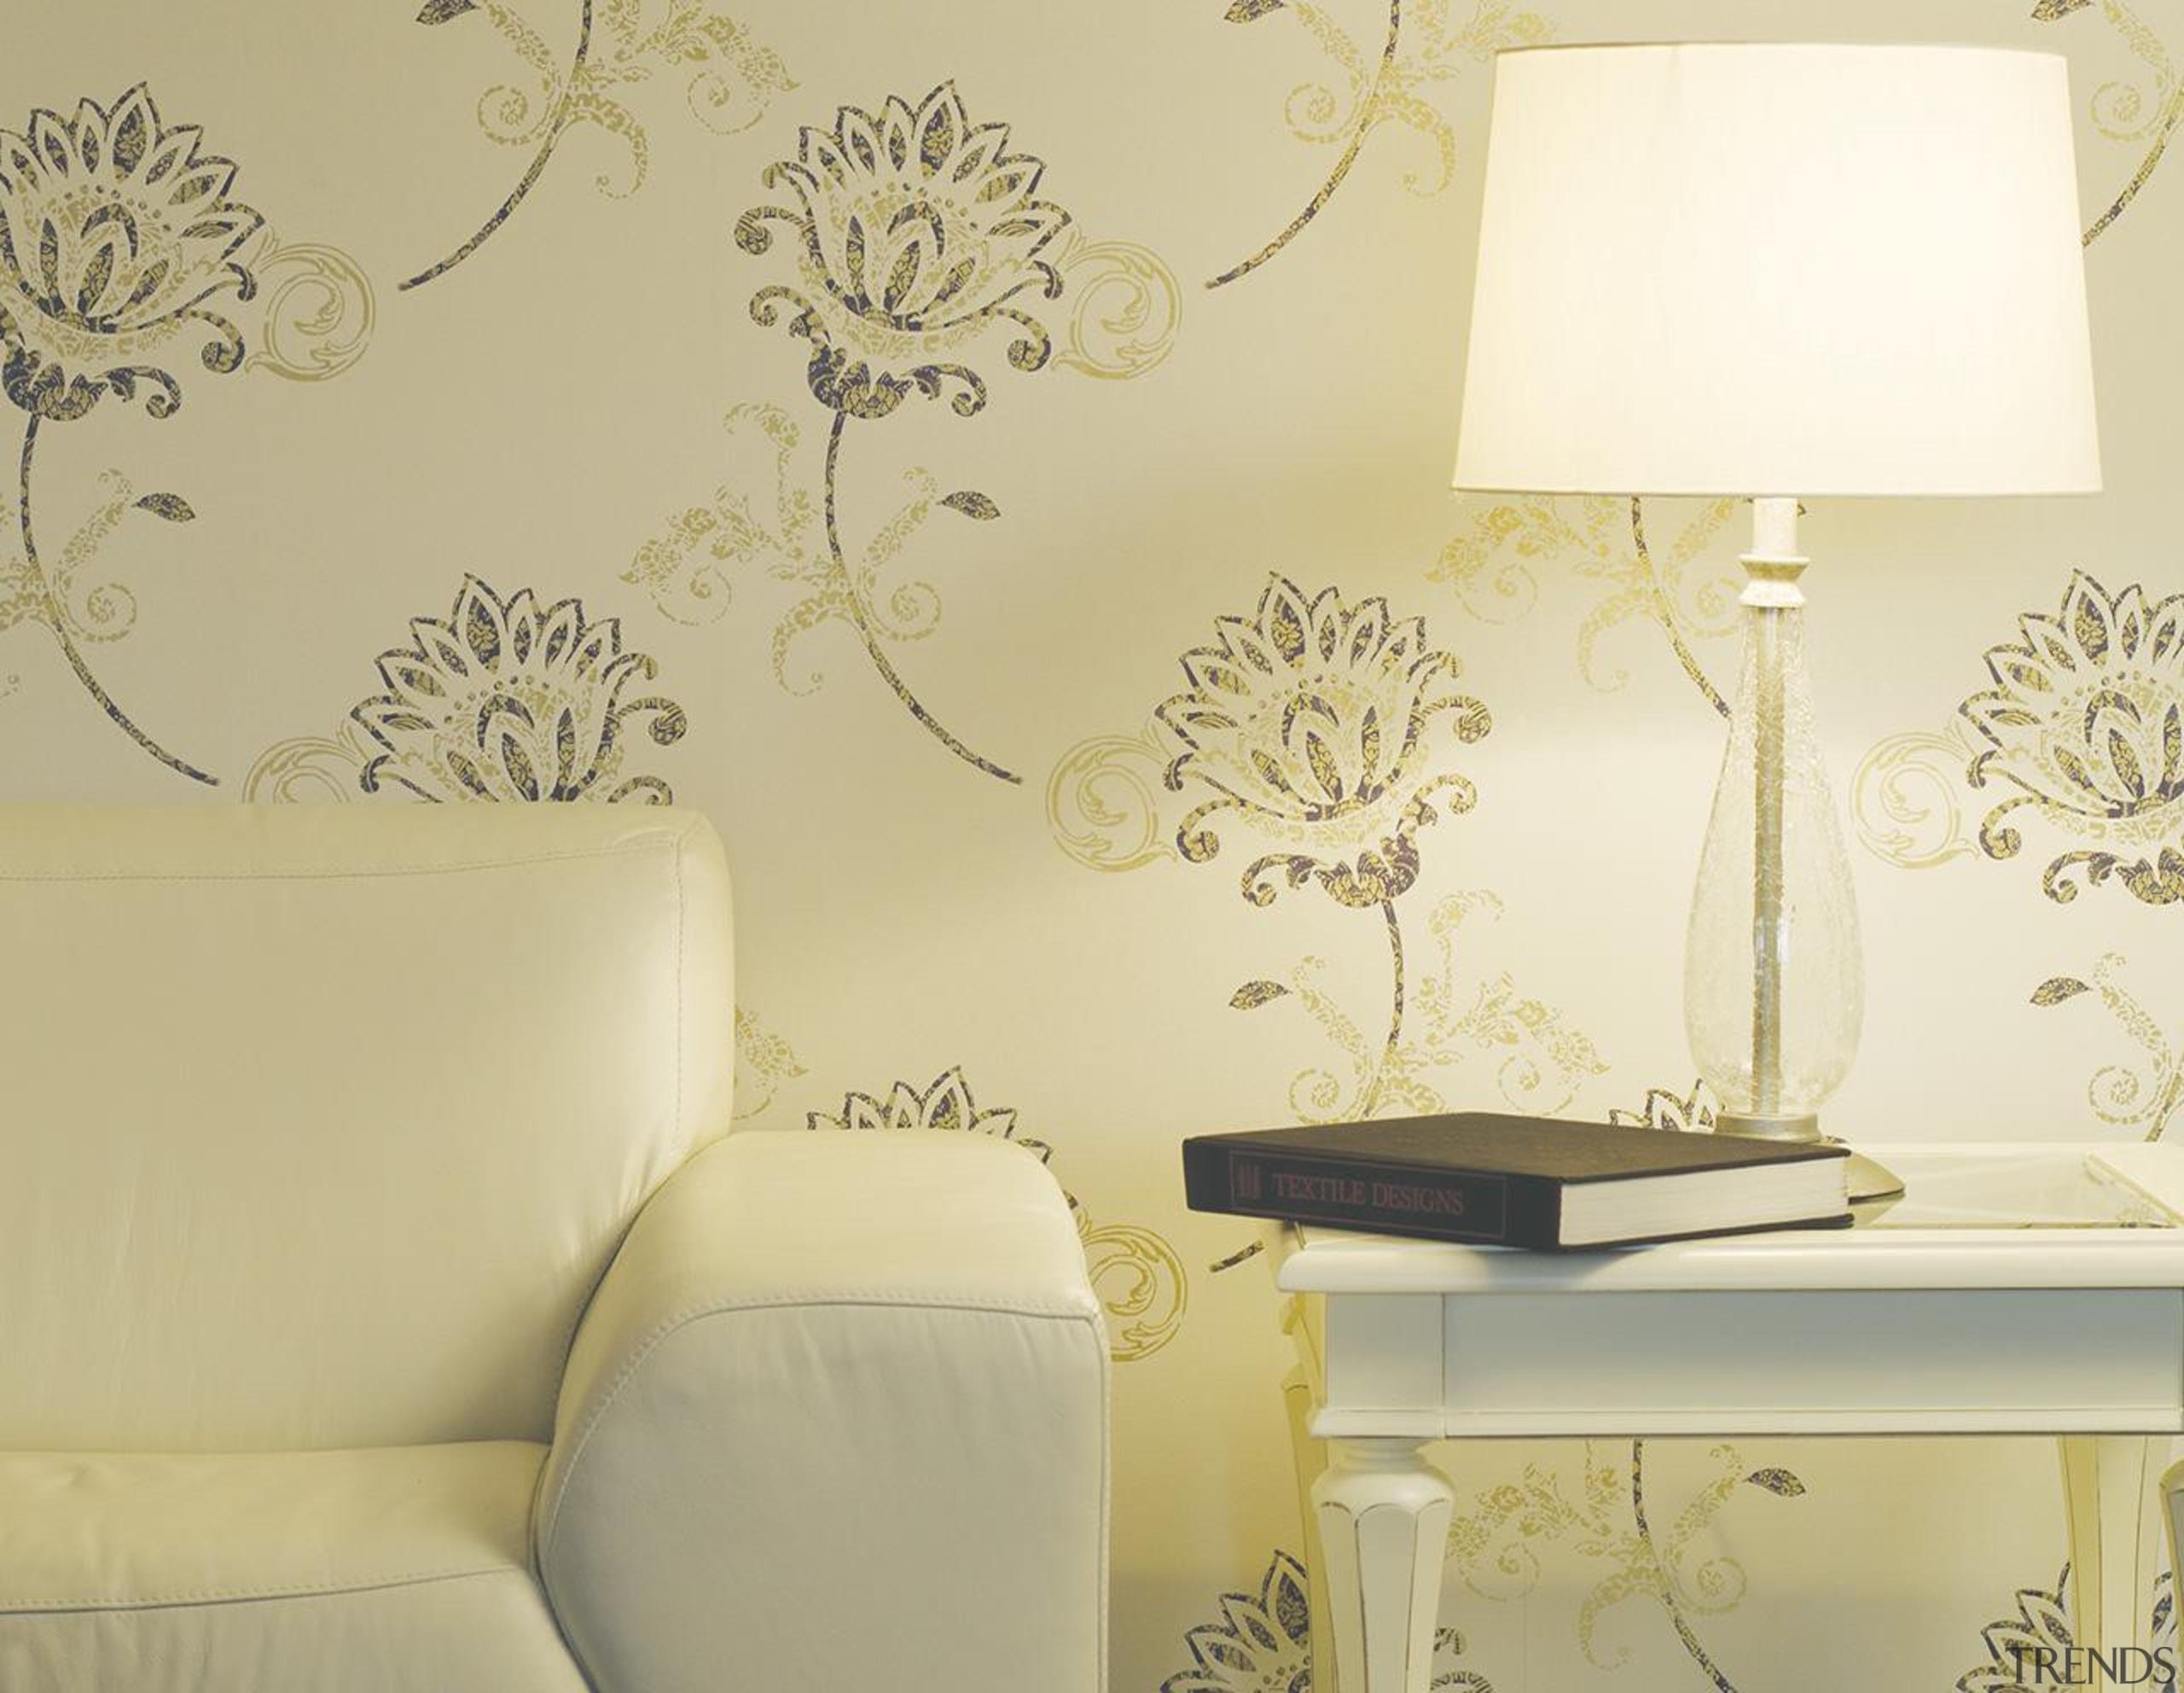 Bloomsbury House - Bloomsbury House Range - ceiling ceiling, interior design, lighting accessory, wall, wallpaper, yellow, orange